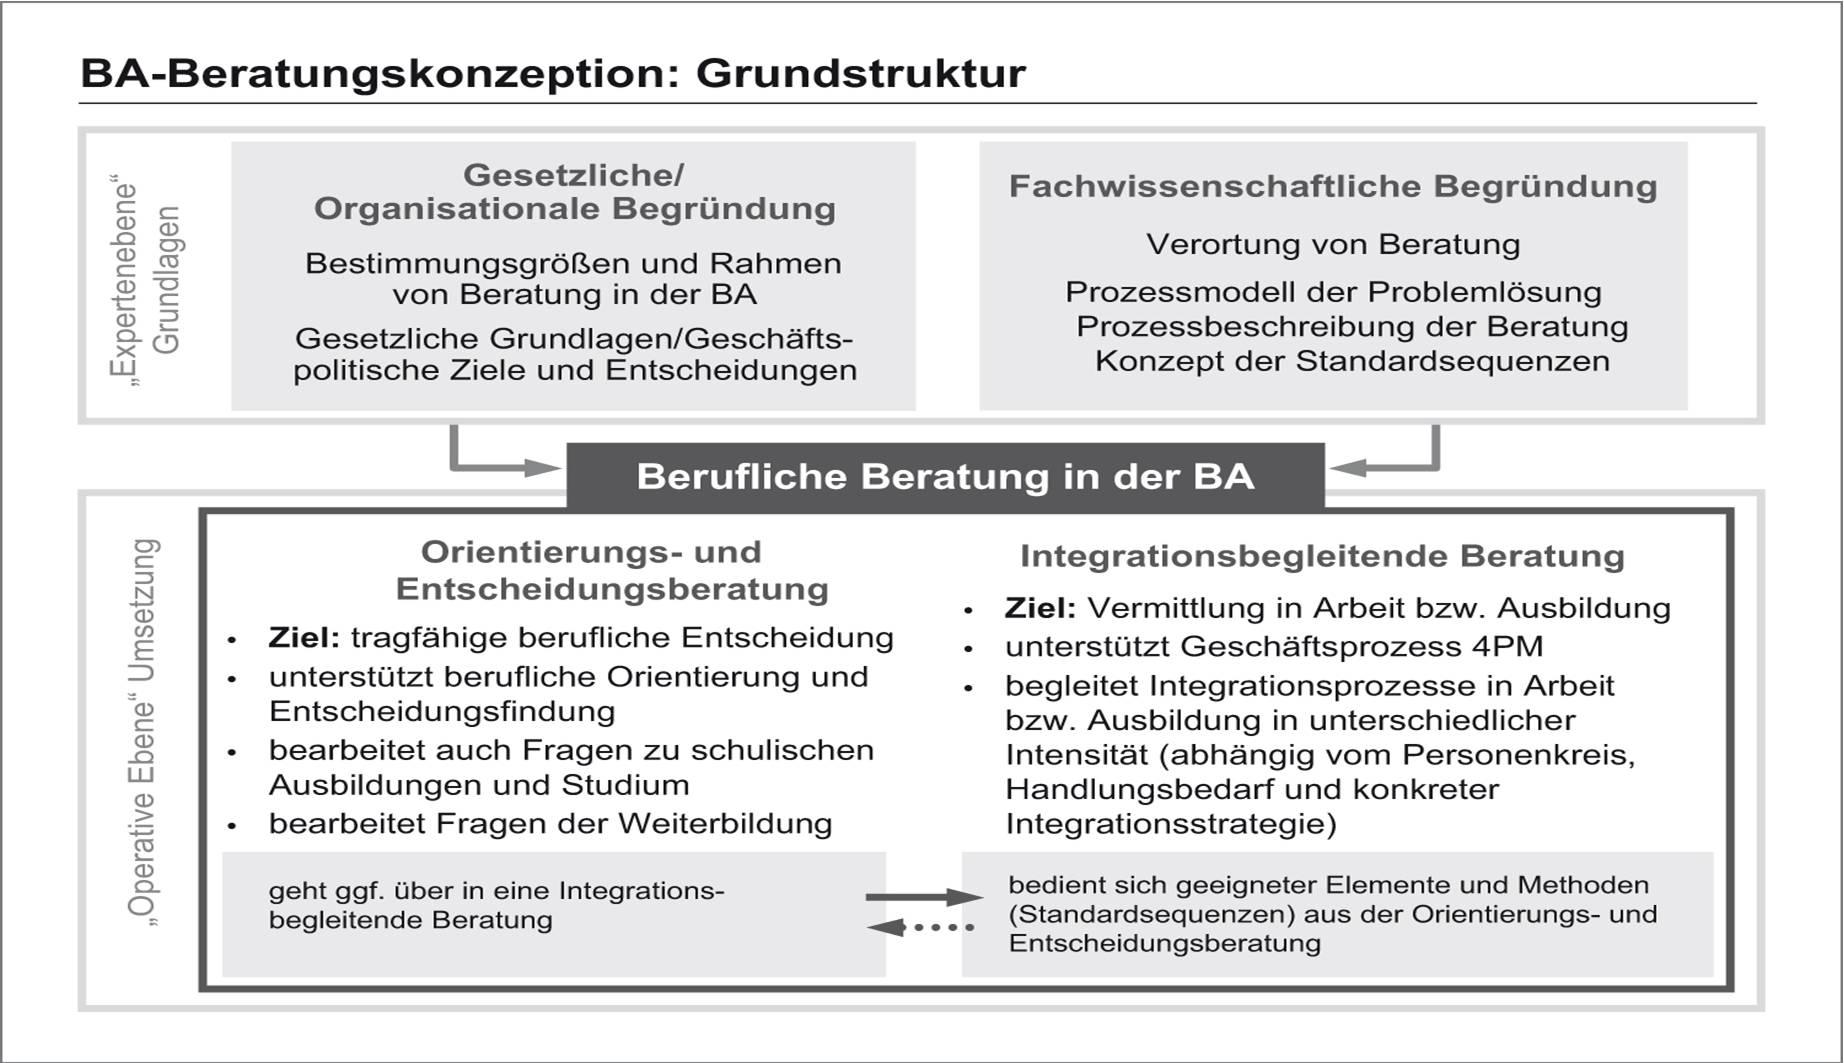 BA Beratungskonzeption